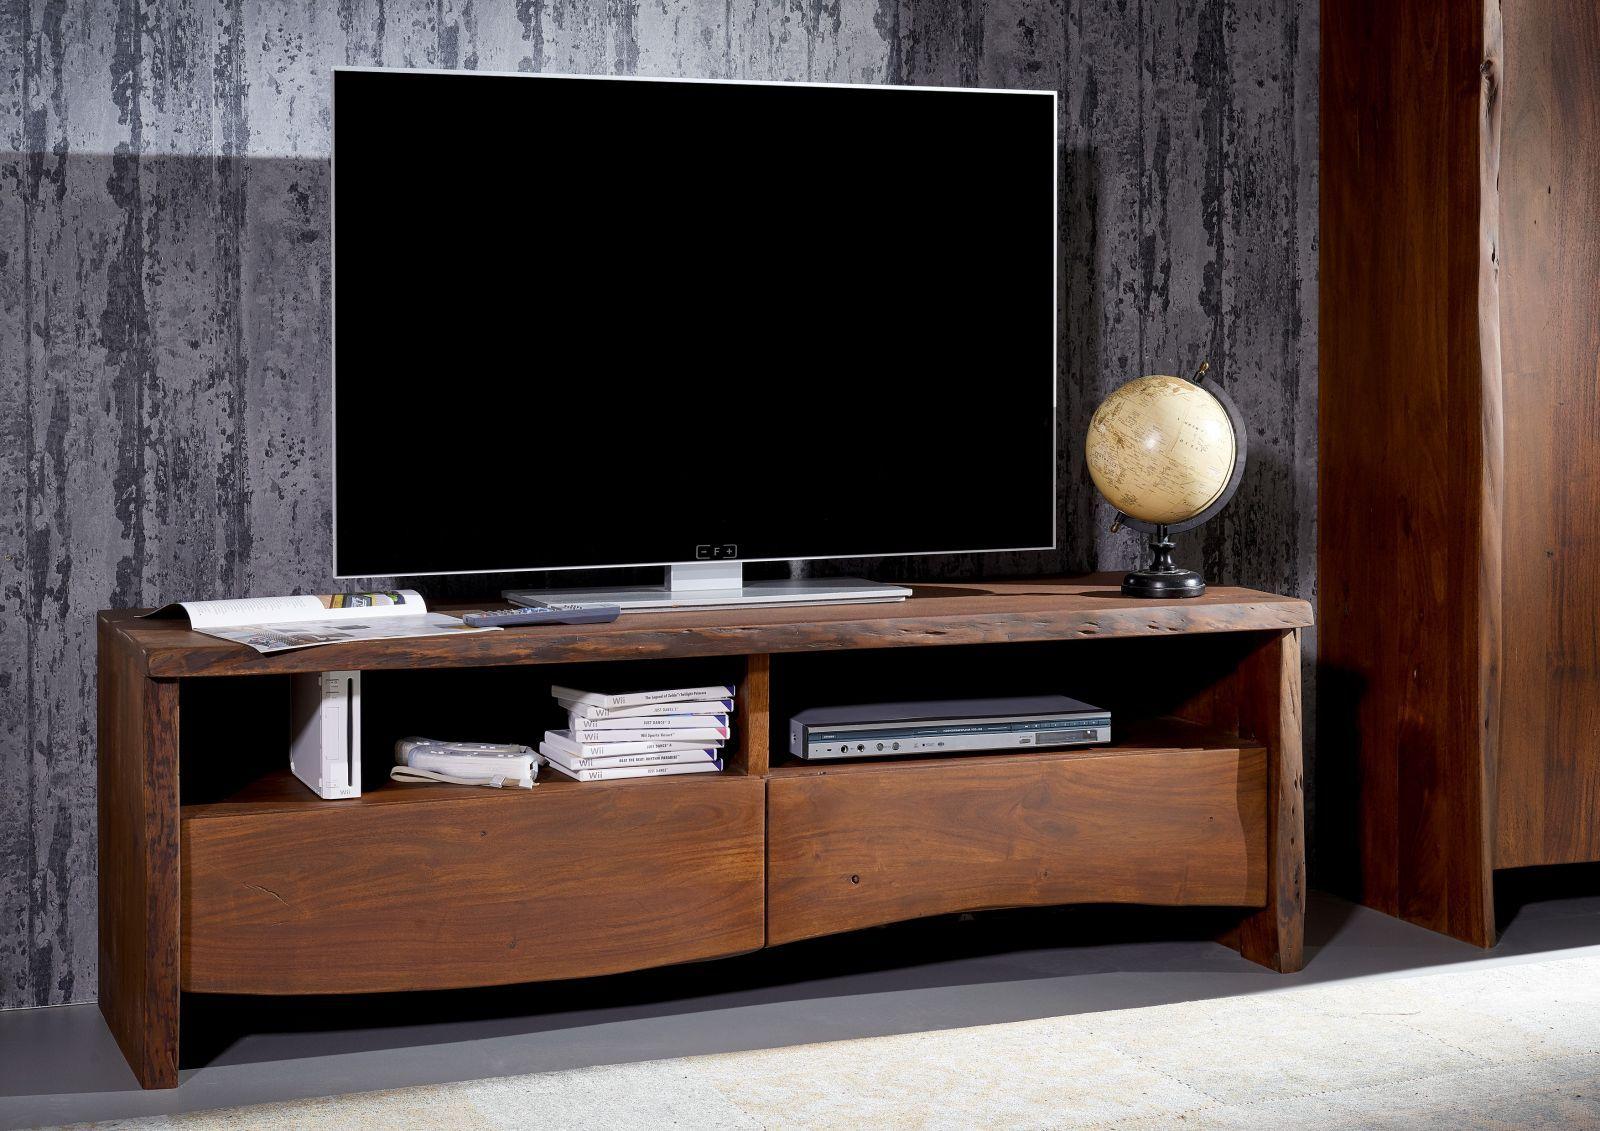 Tv Board Akazie 151x45x50 Braun Lackiert Live Edge 208 Tv Mobel Weiss Tv Hifi Mobel Wohnen